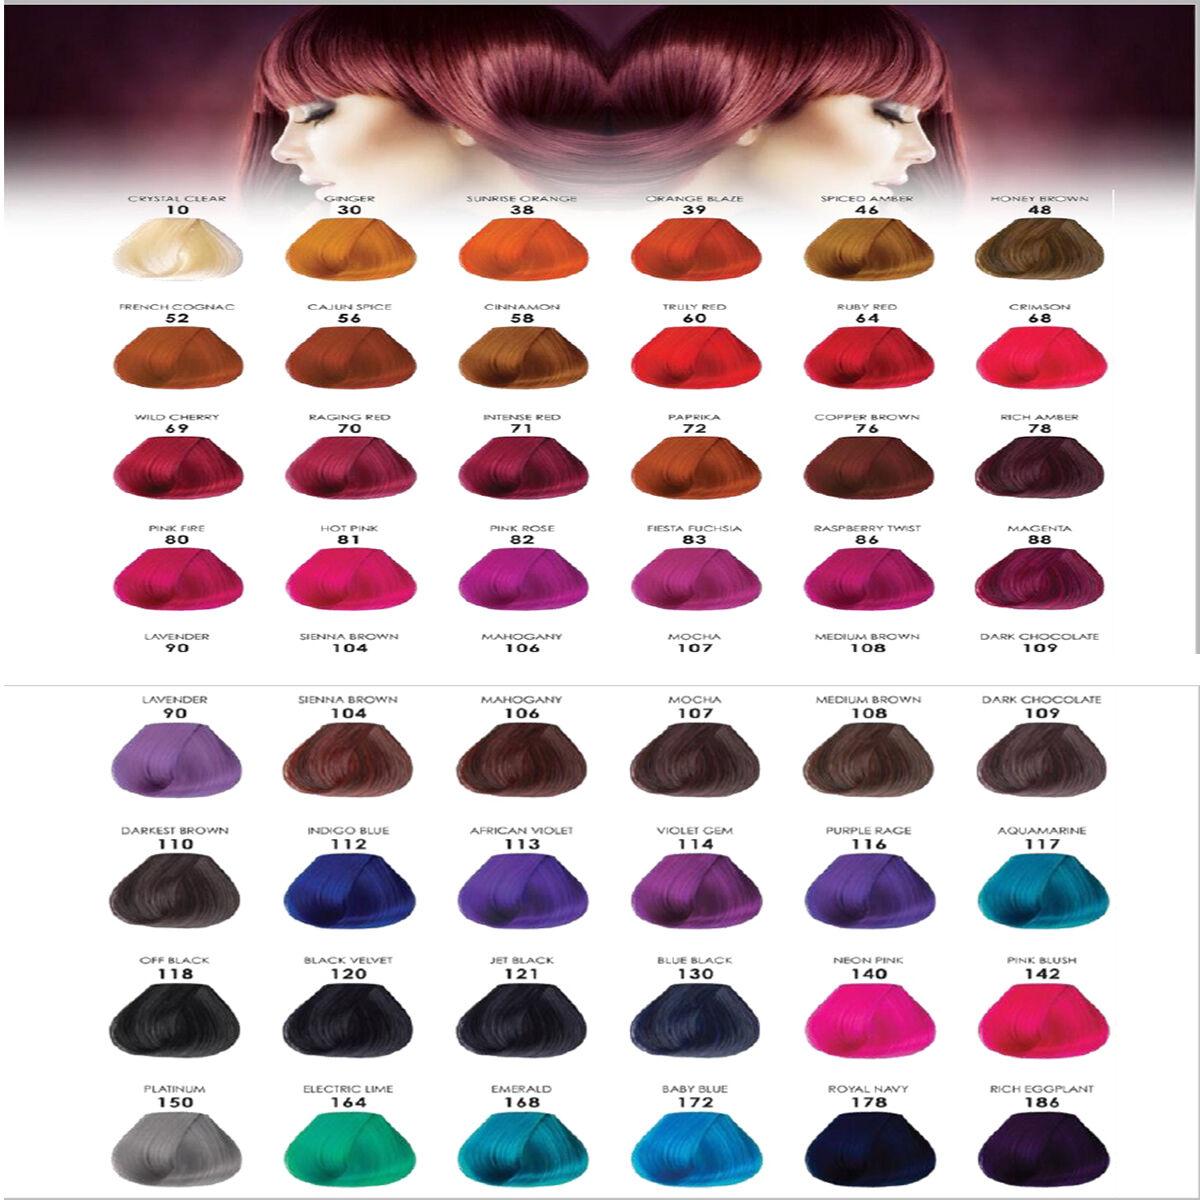 Adore Semi Permanent Hair Dye Colour Ammonia Peroxide Alcohol Free 118 Ml